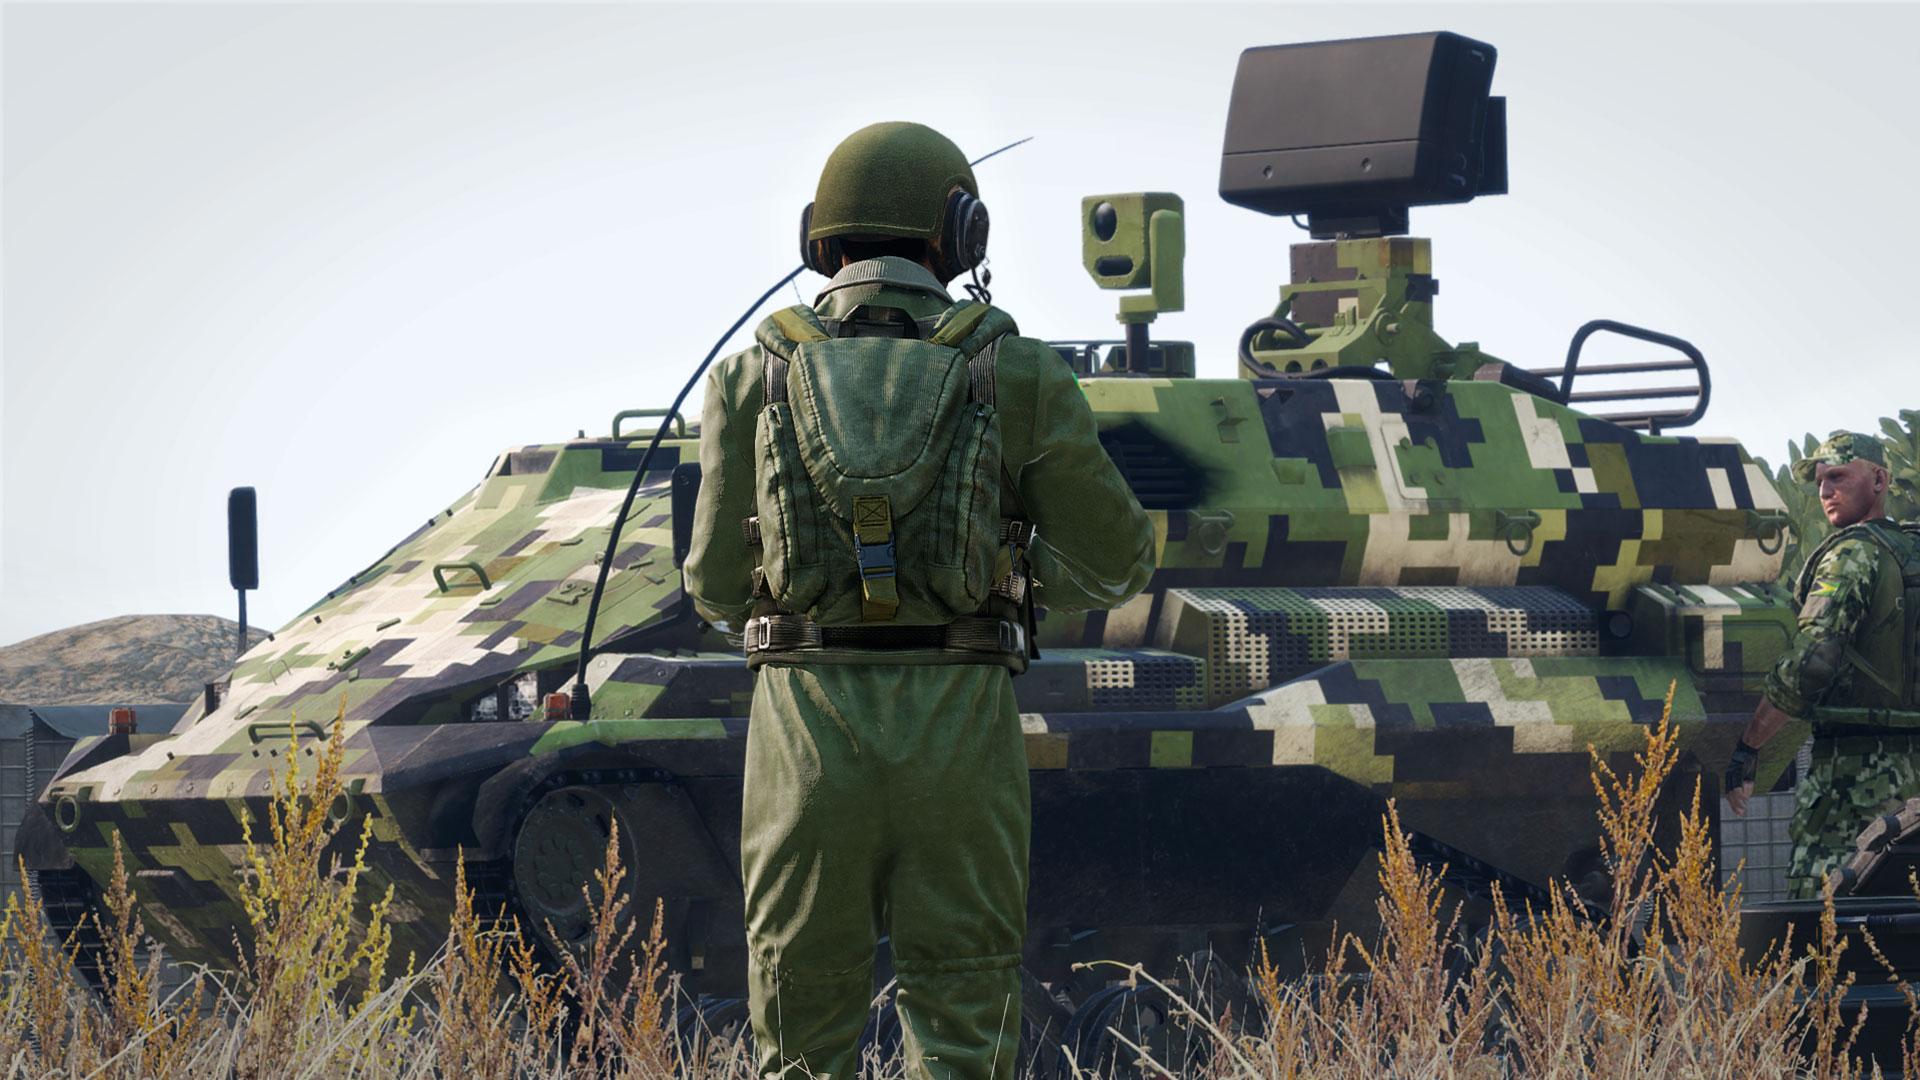 arma3_dlc_tanks_screenshot_04